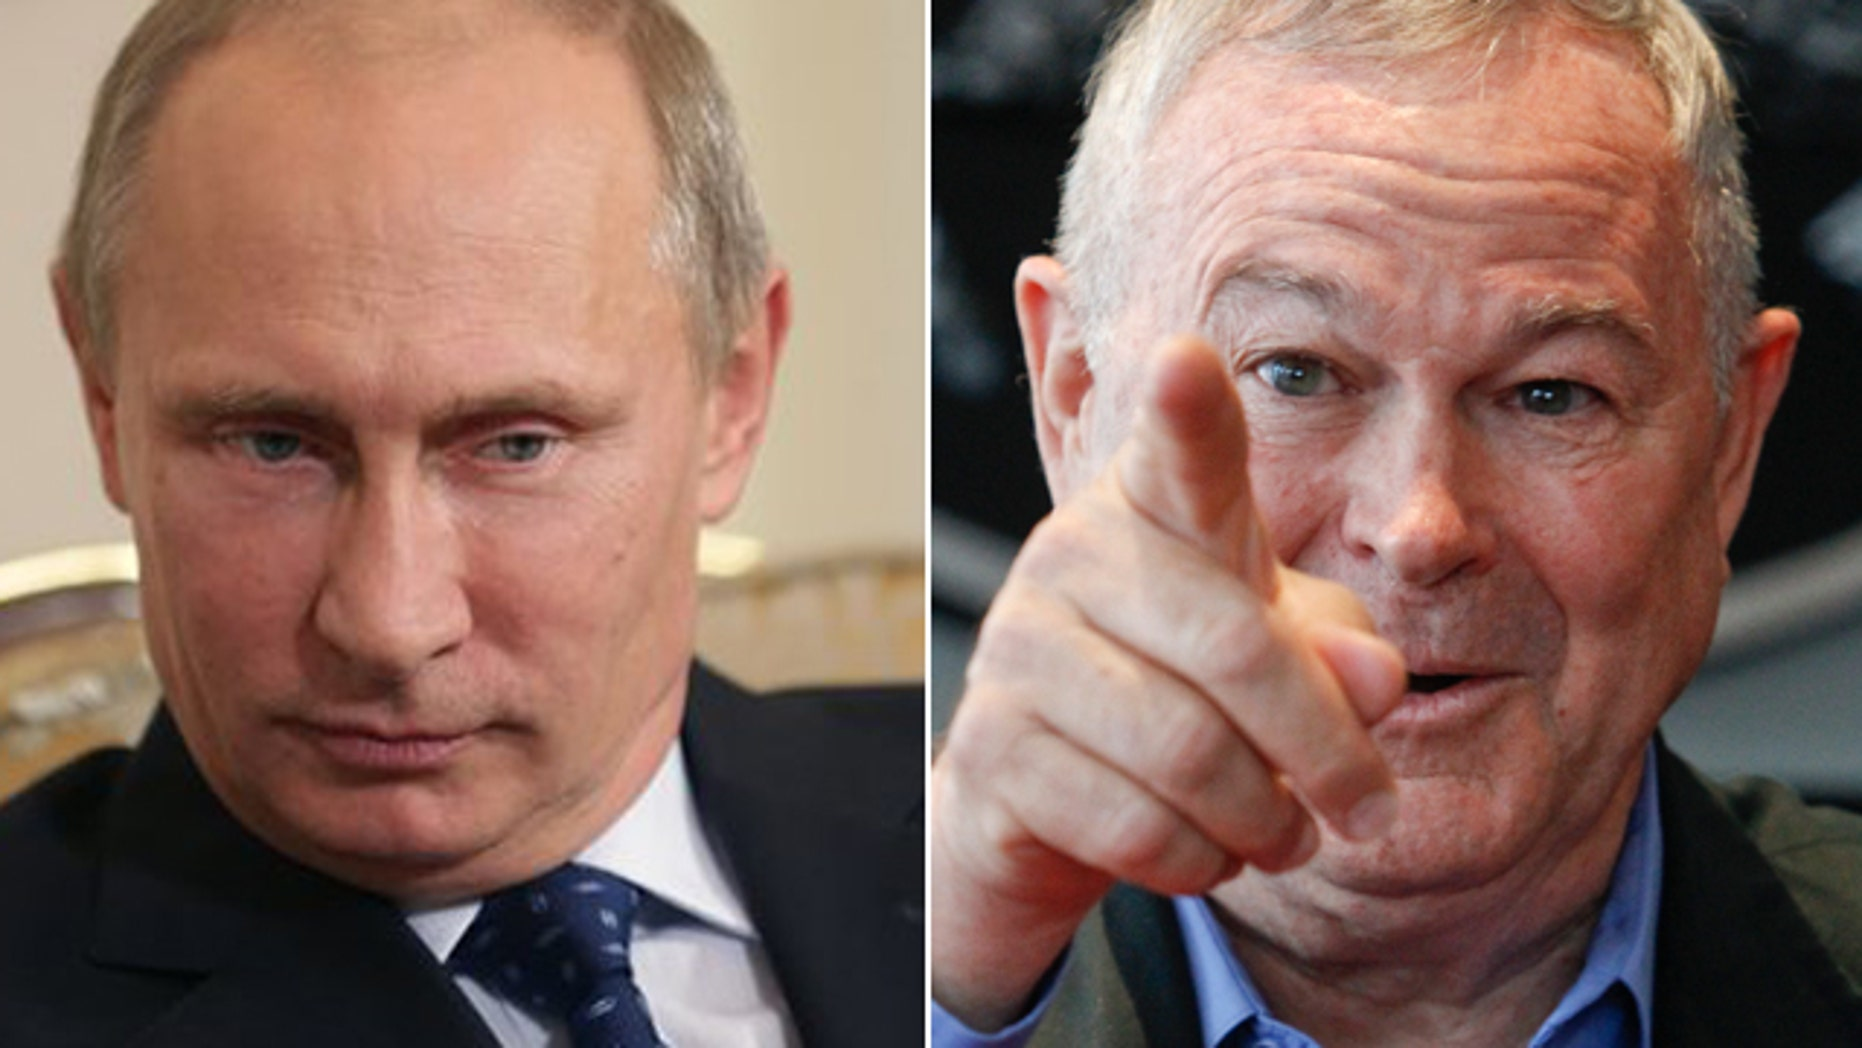 Russian President Vladimir Putin, left, and U.S. Rep. Dana Rohrabacher.